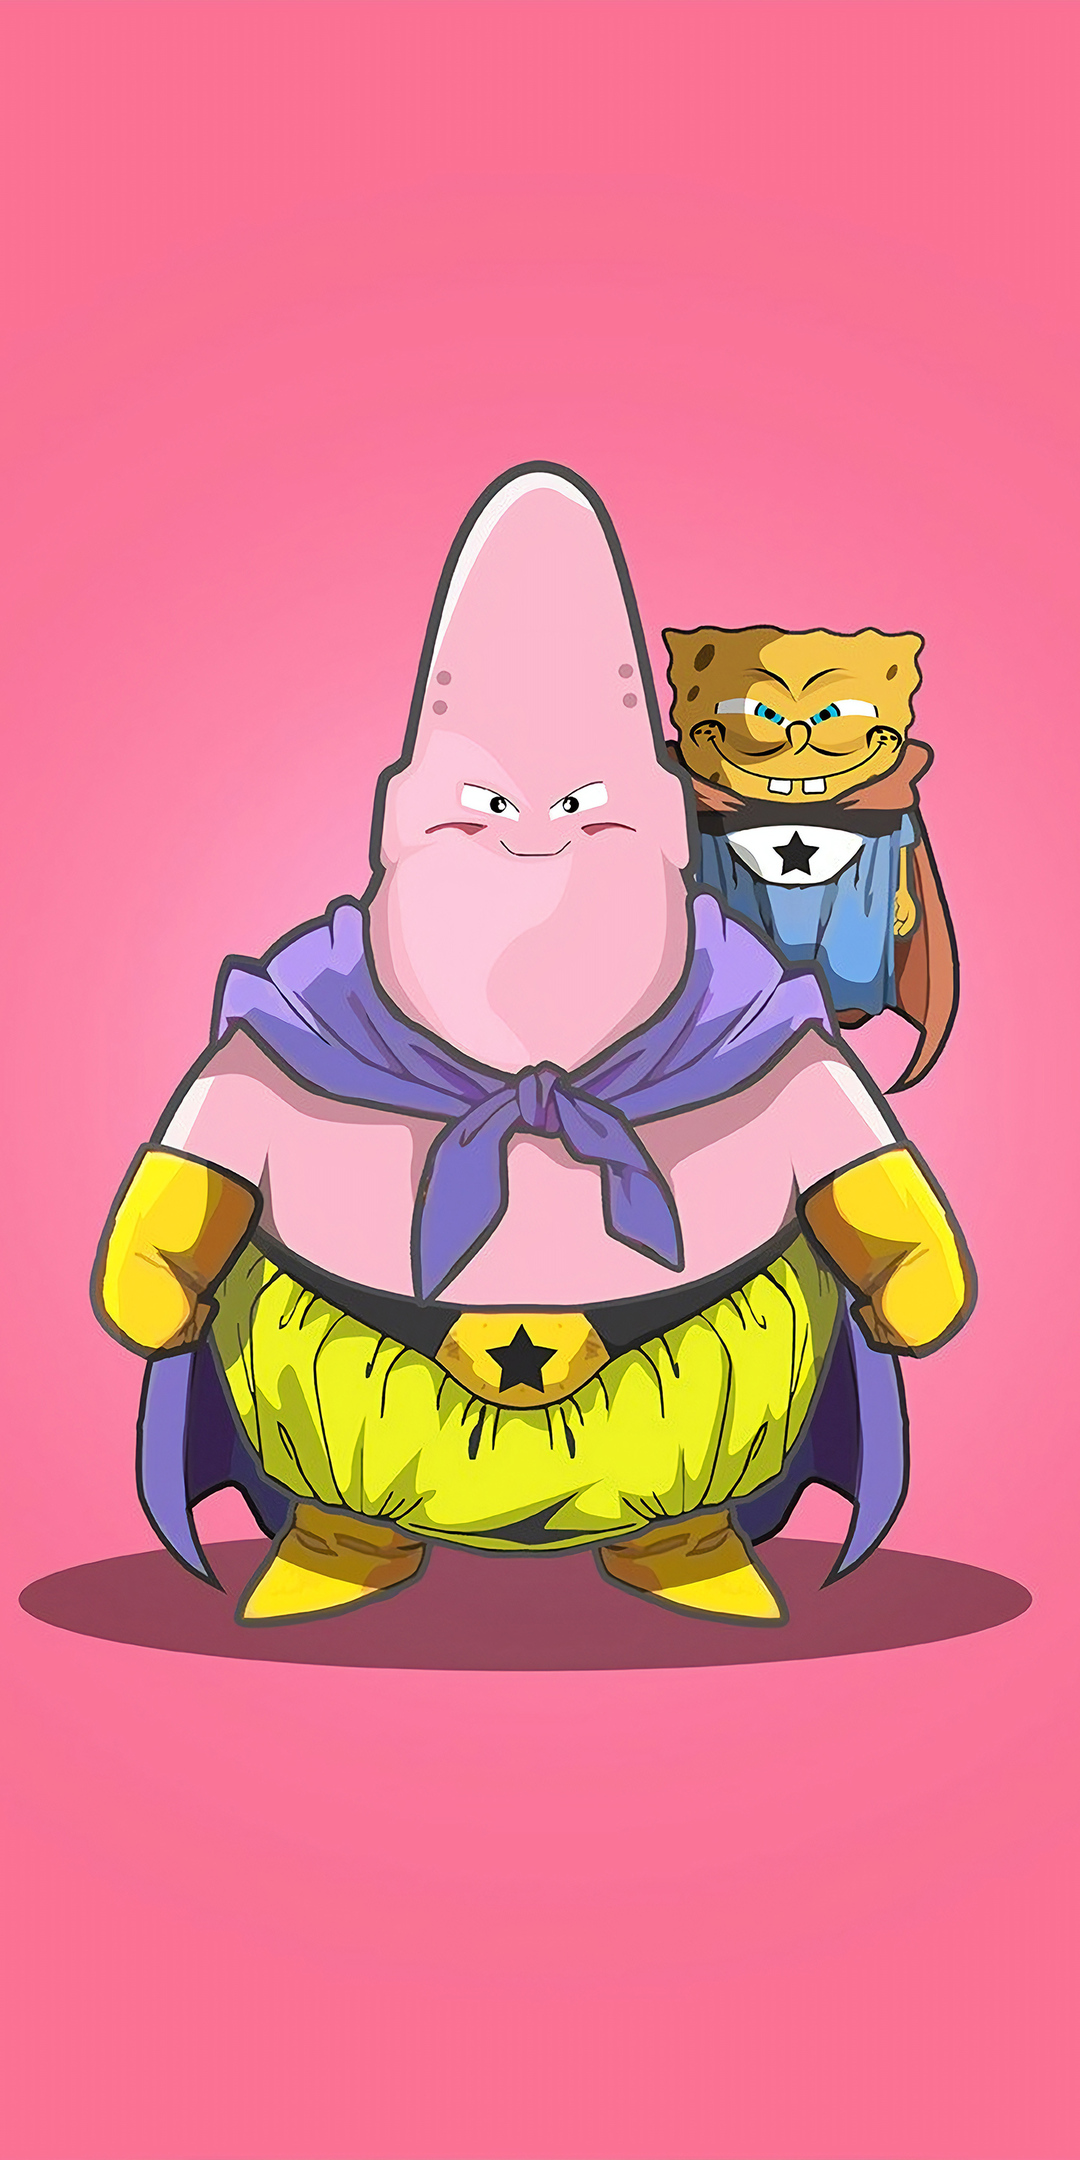 spongebob-square-pants-hb.jpg